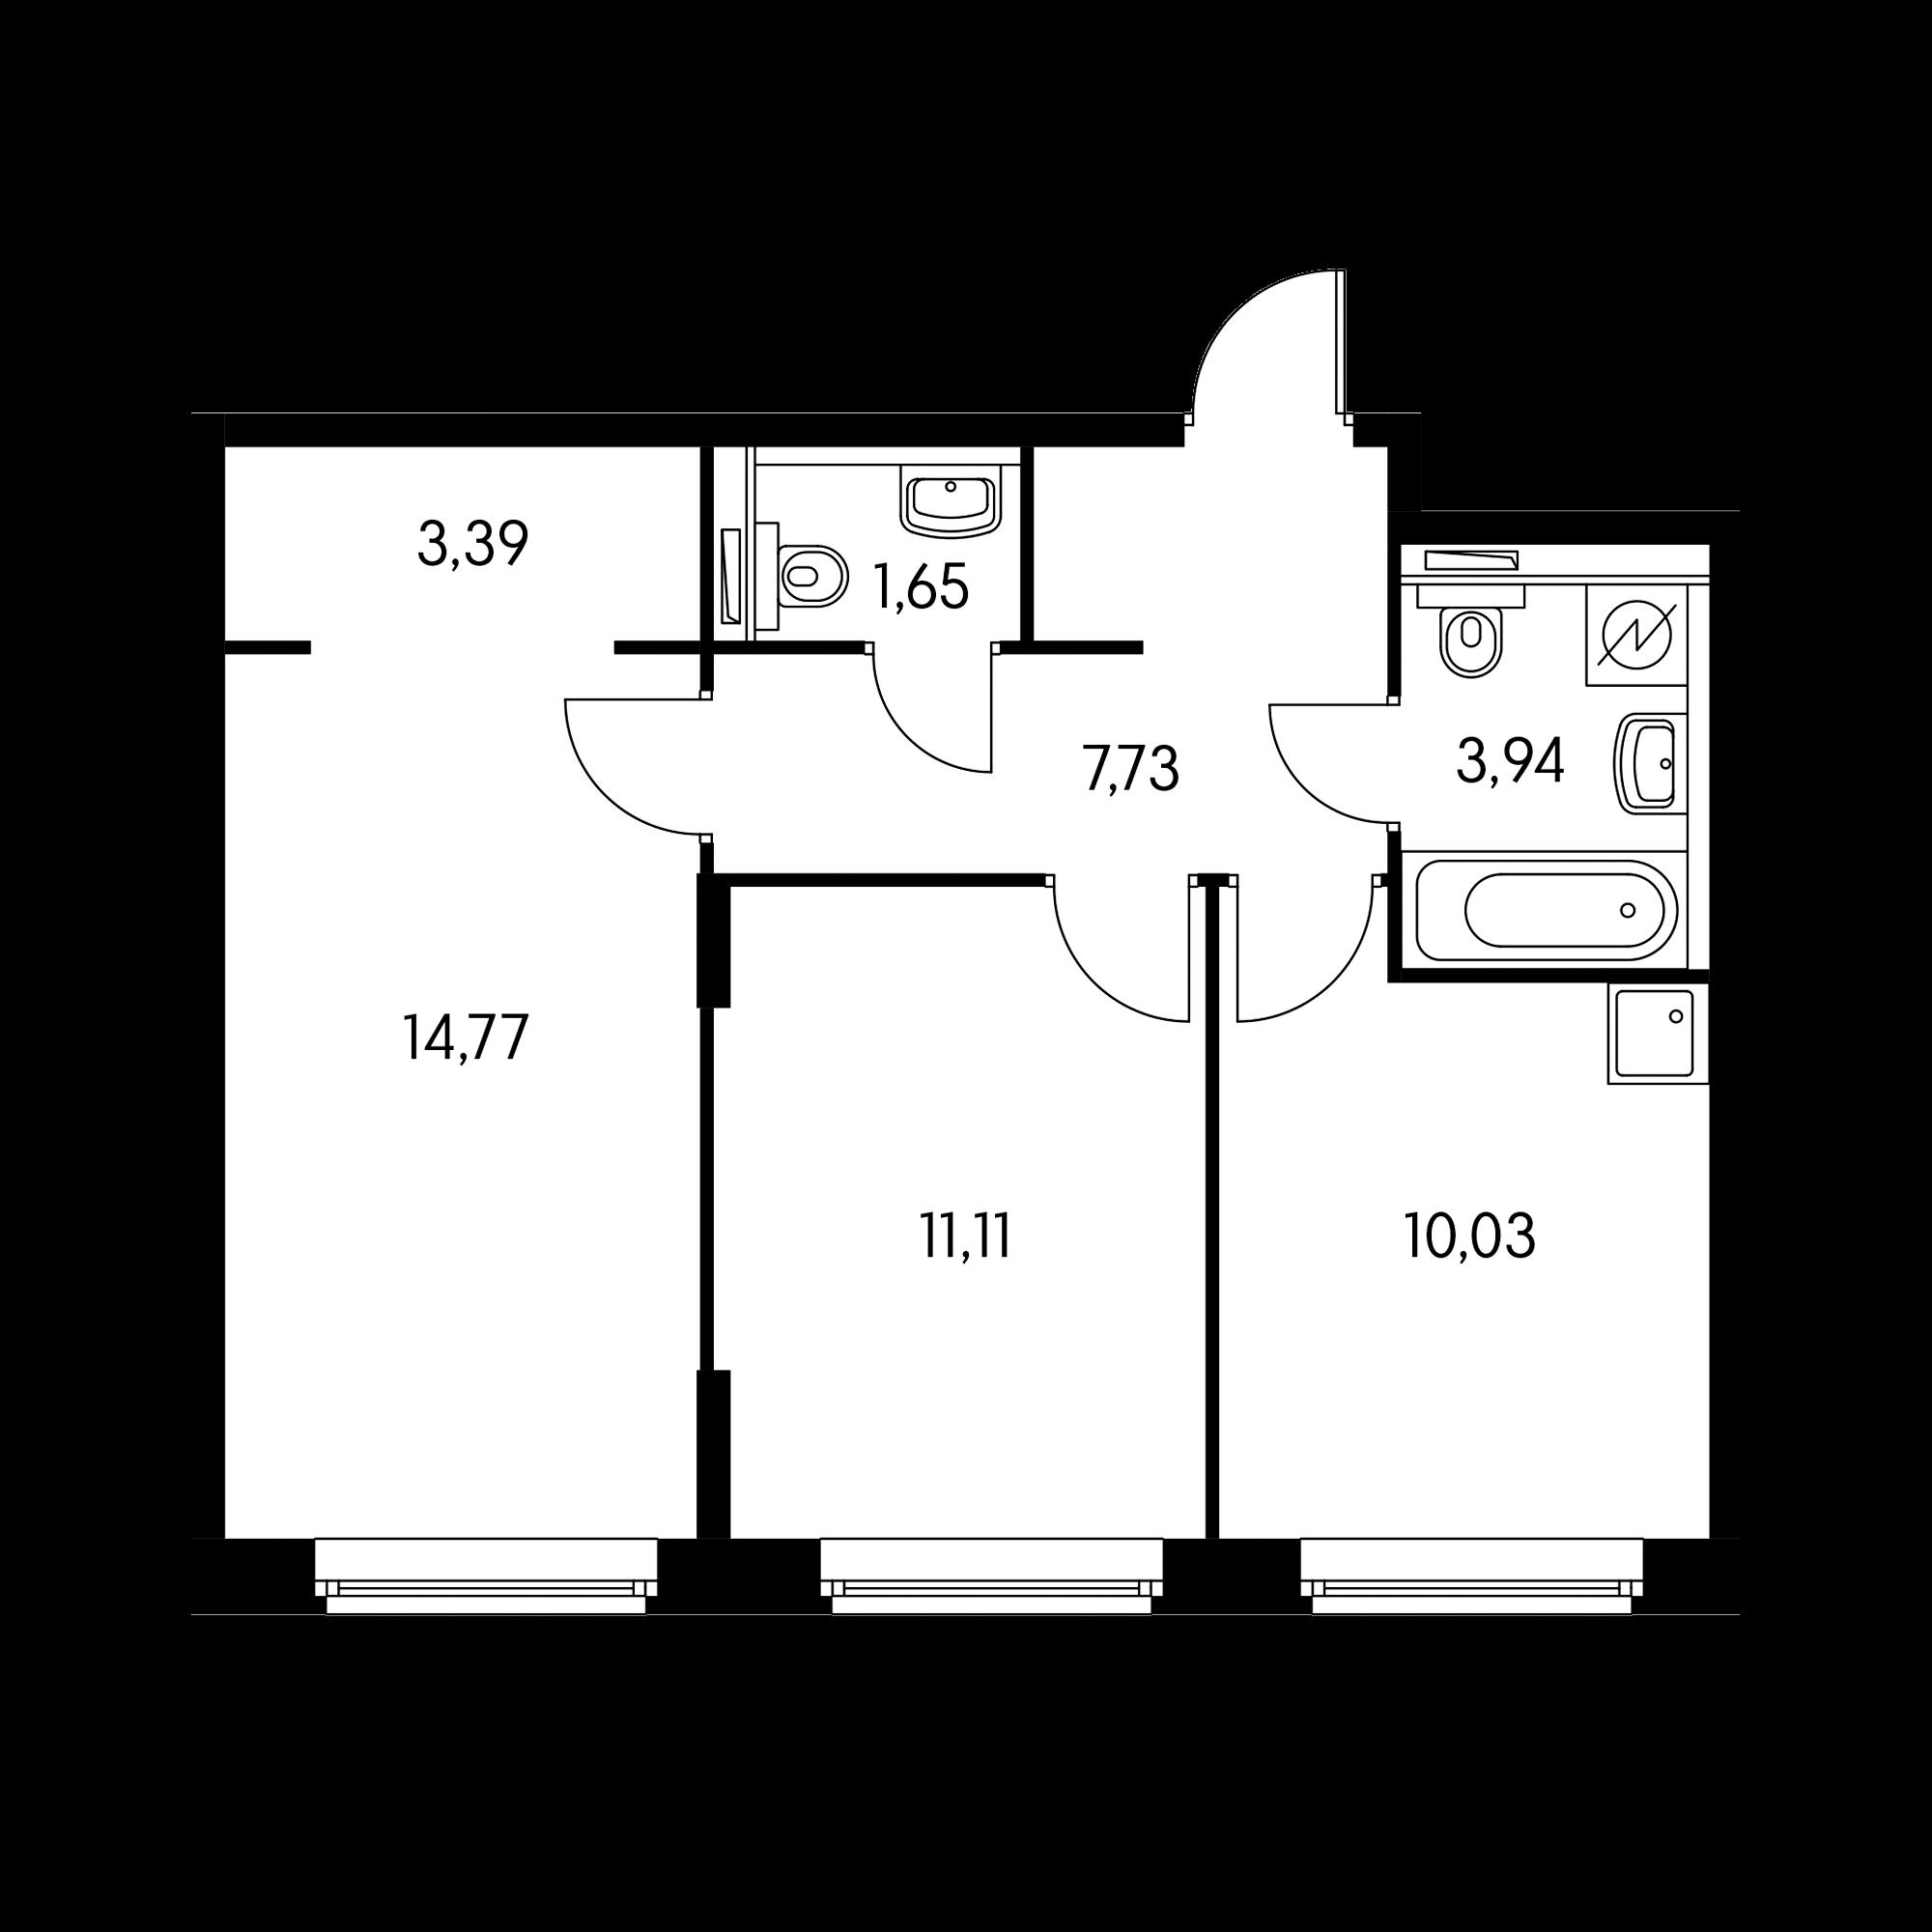 2KS6_9.0-1